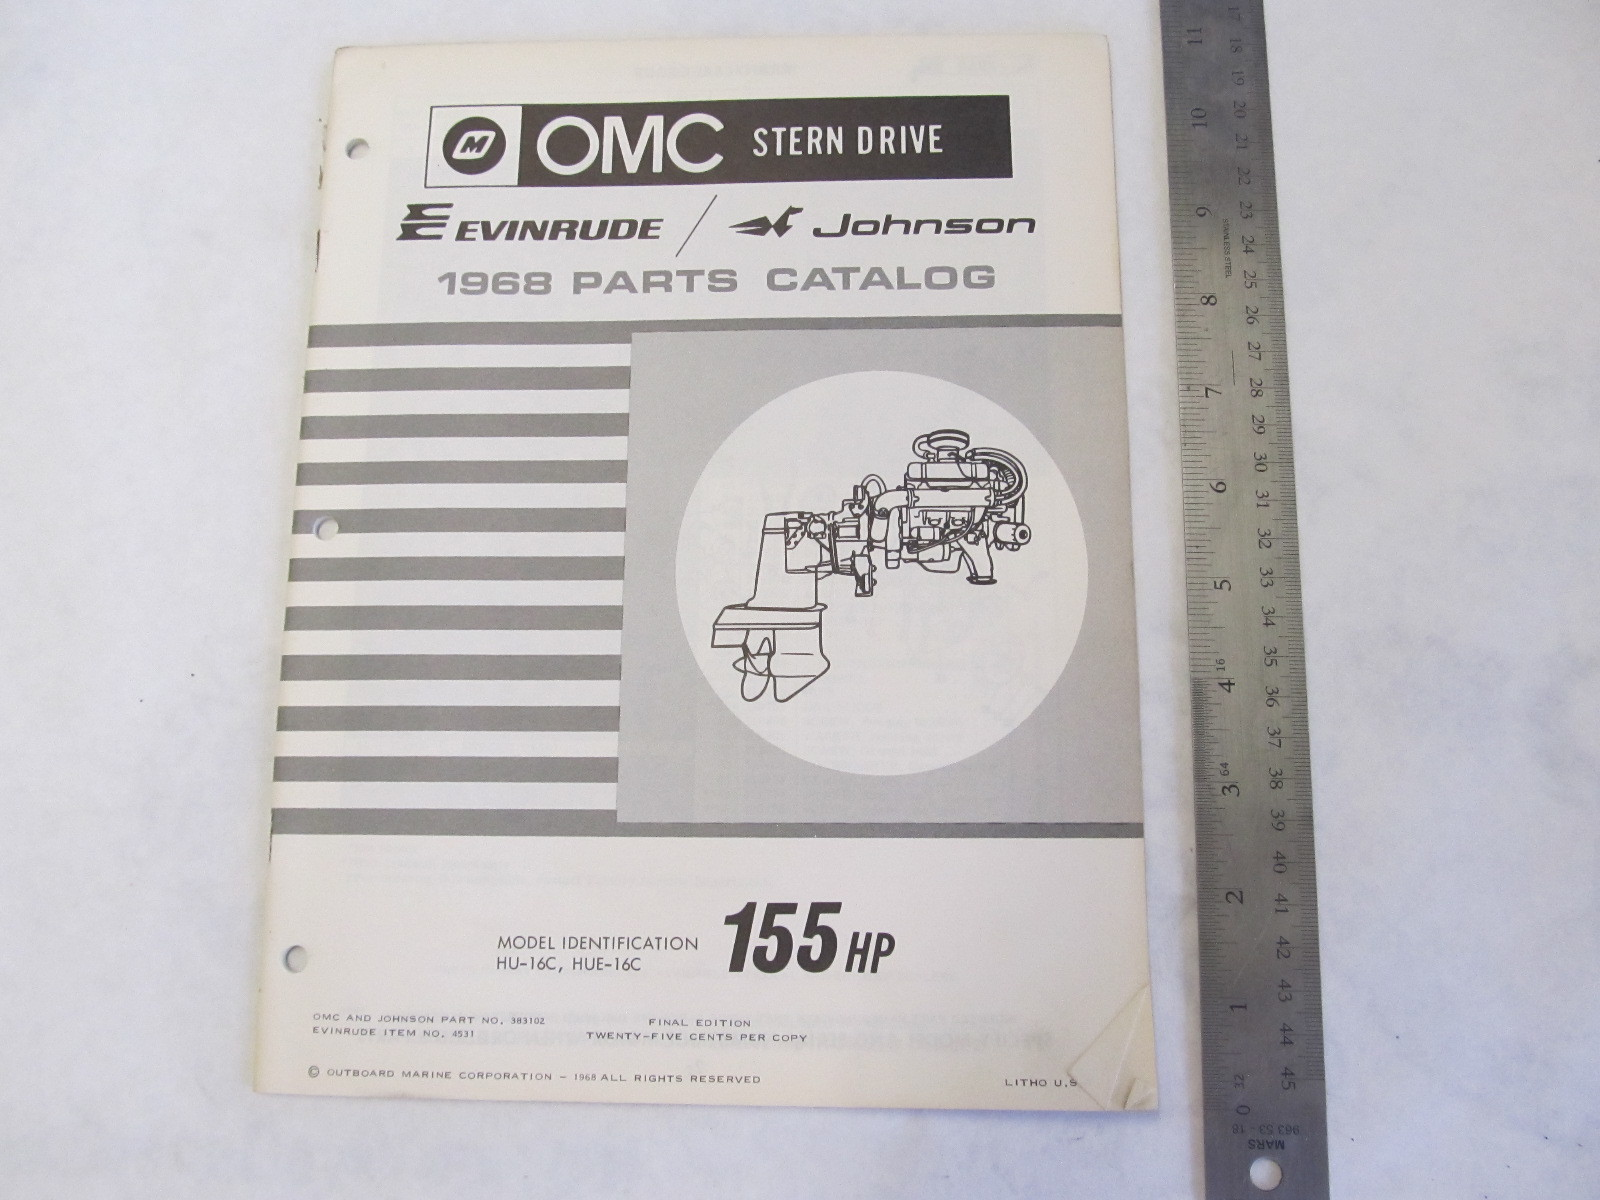 Sell 1968 OMC Stern Drive Parts Catalog 155 HP HU-16C HUE-16C